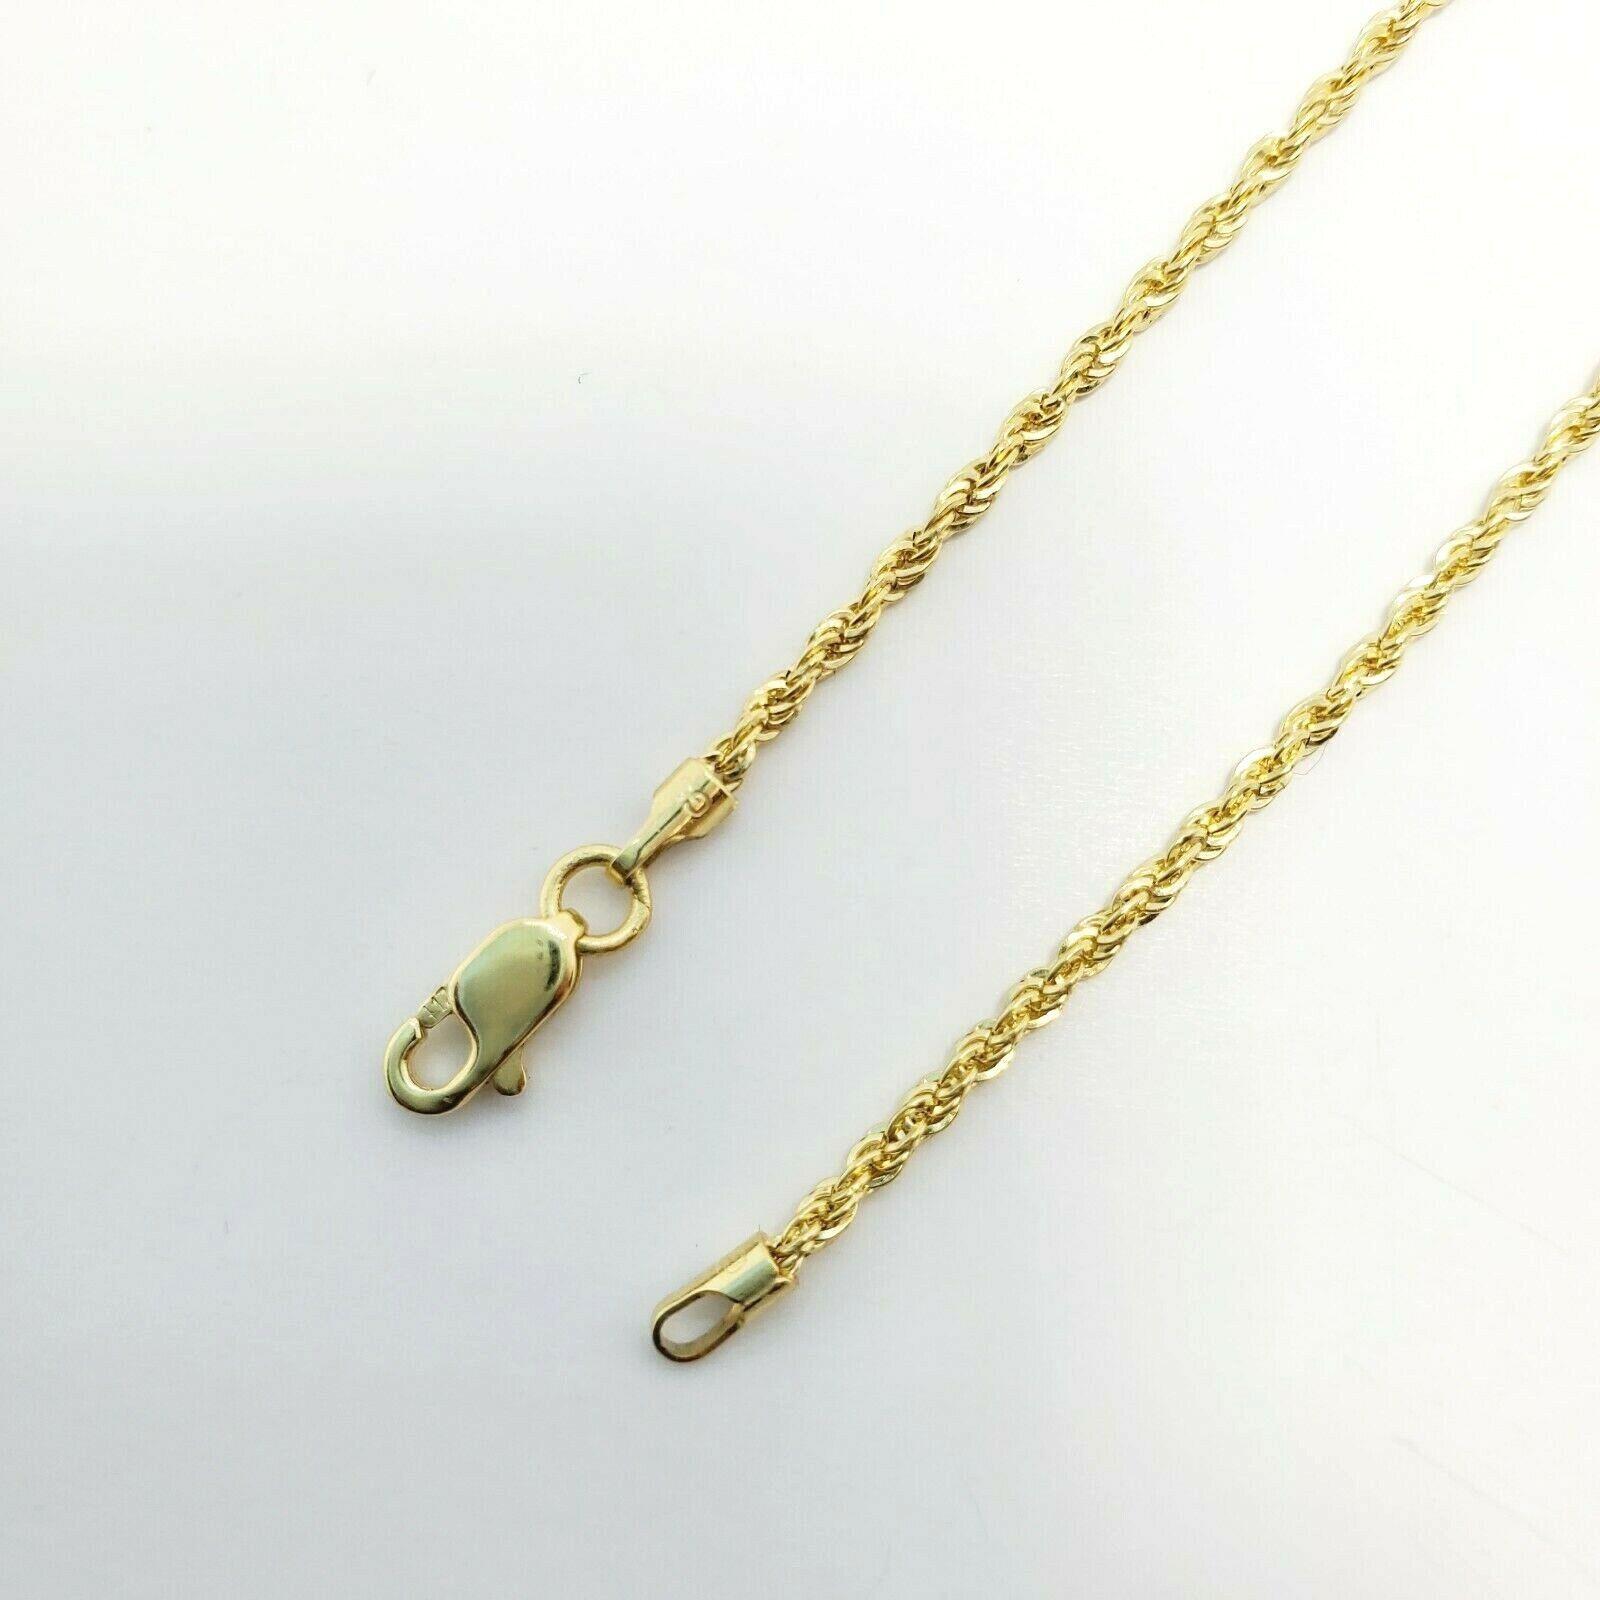 "10K Yellow Gold 1.5mm Diamond Cut Rope Chain Pendant Necklace Mens Women 16""-26"" 5"